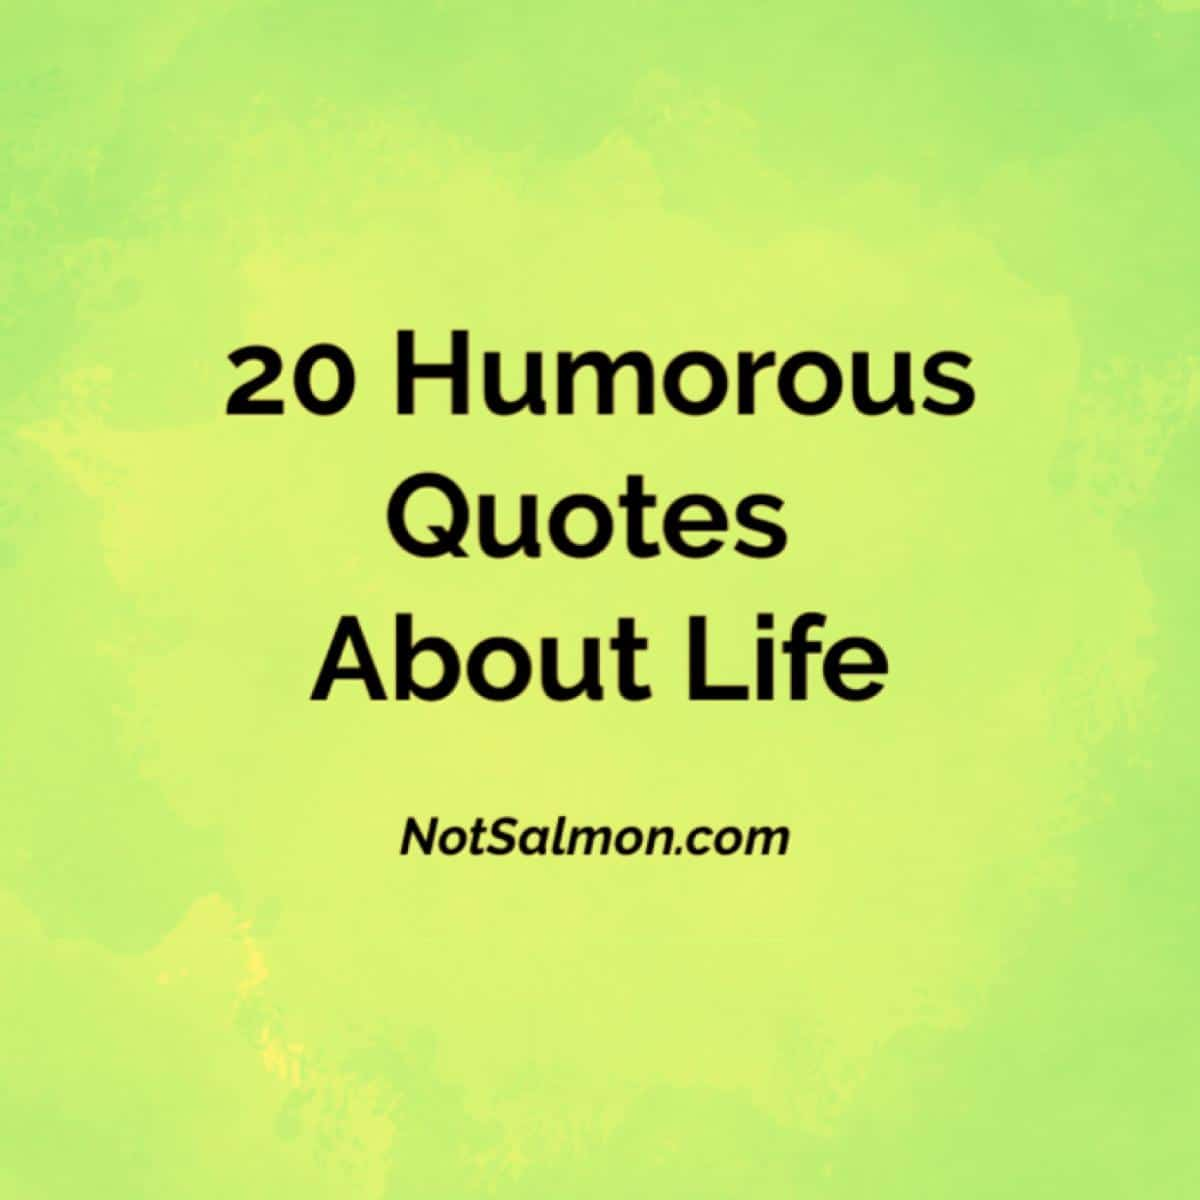 20 Humorous Quotes About Life - Karen Salmansohn